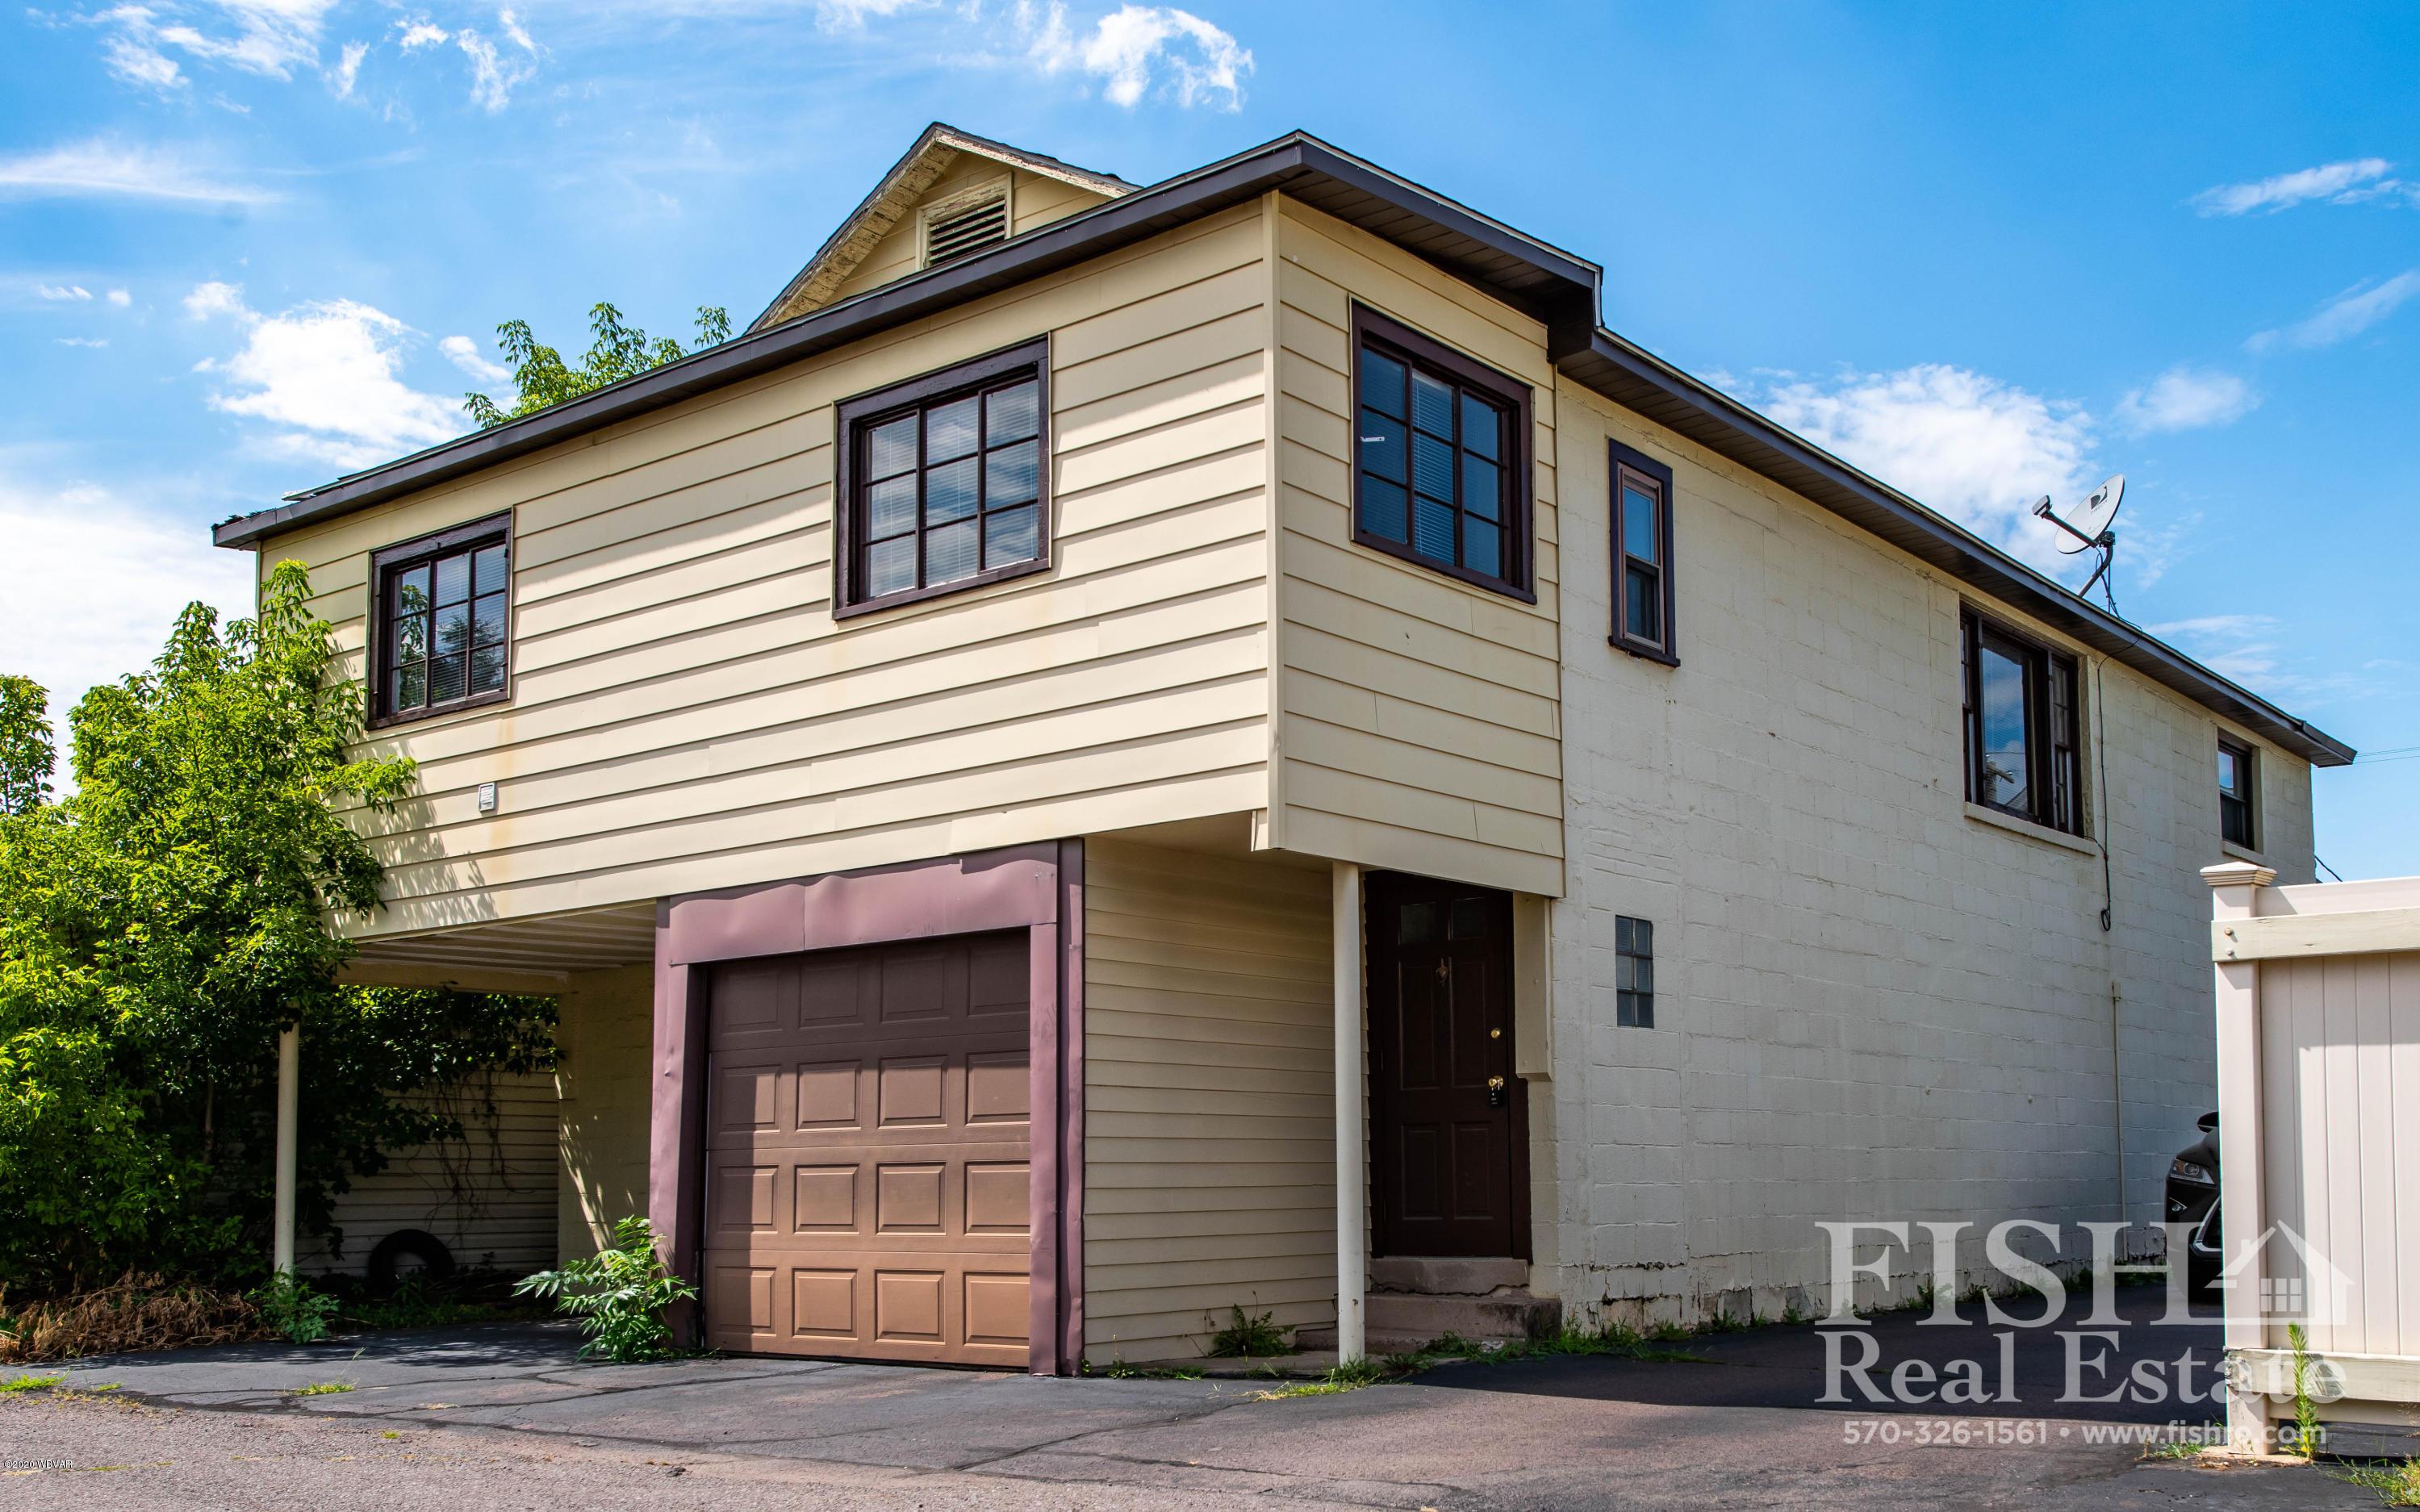 636-638 OLD BERWICK ROAD, Bloomsburg, PA 17815, ,Multi-units,For sale,OLD BERWICK,WB-89565